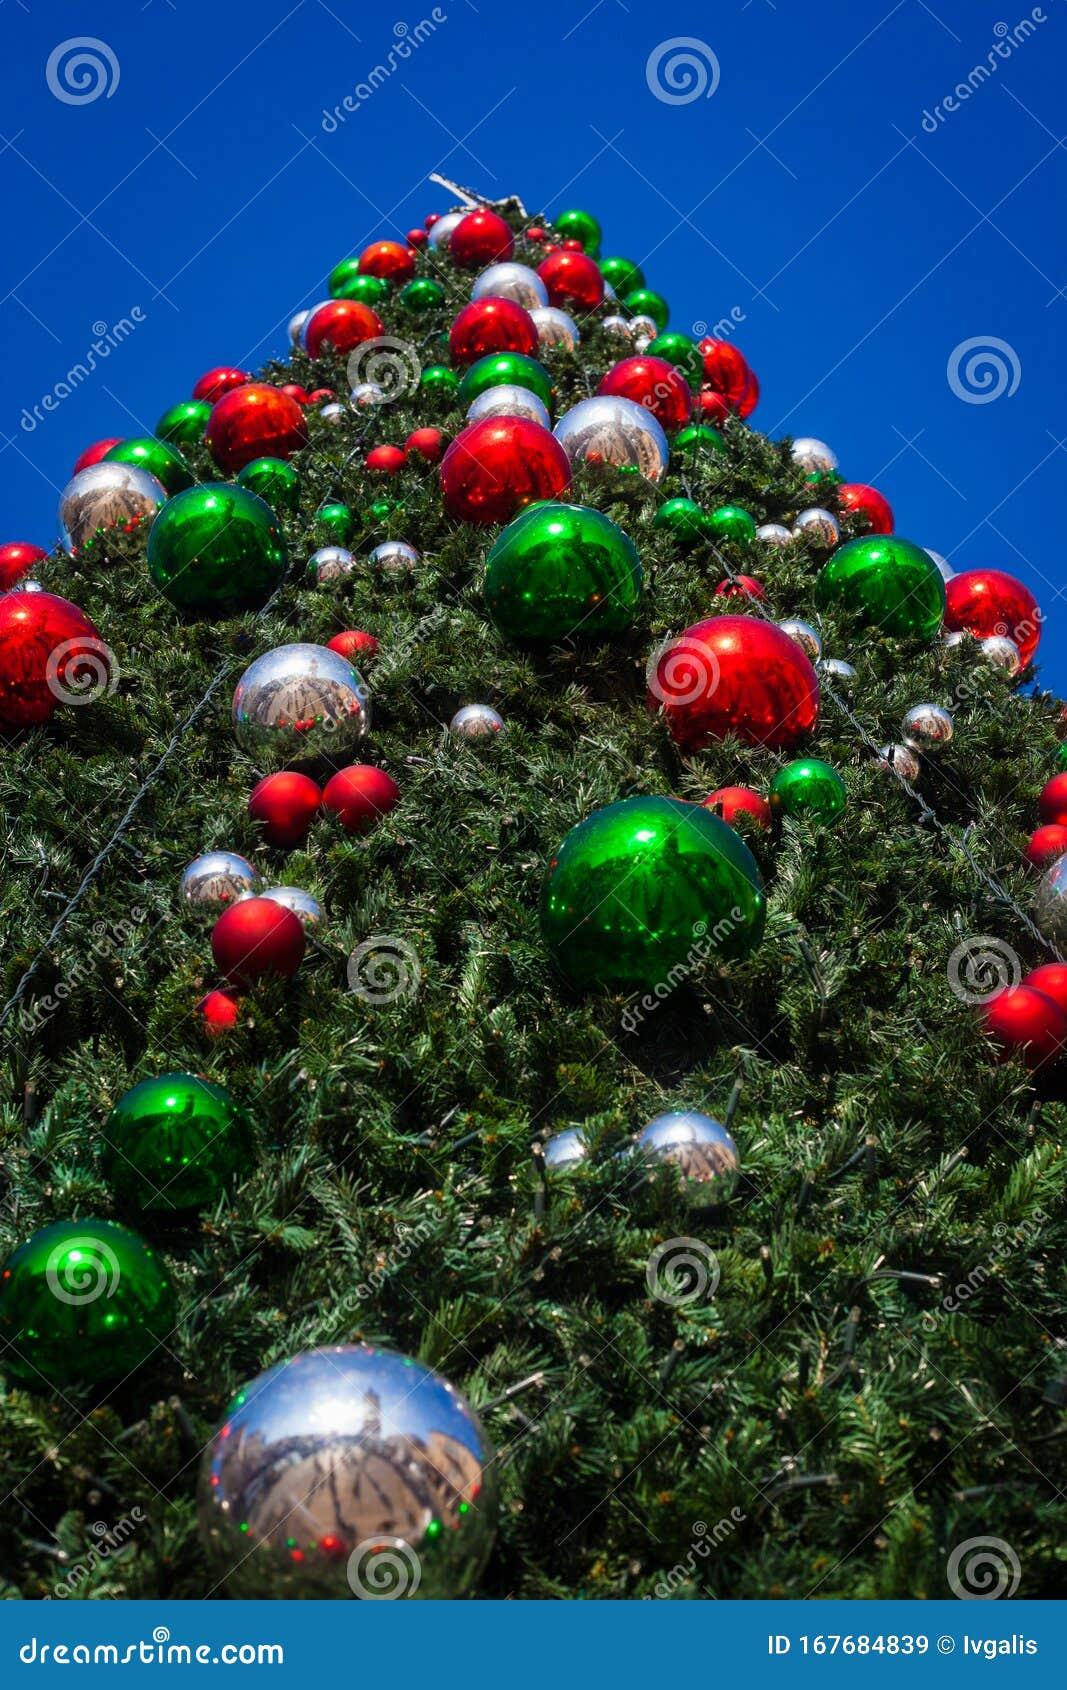 Giant Christmas Tree Outdoors Stock Image Image Of Lights Green 167684839